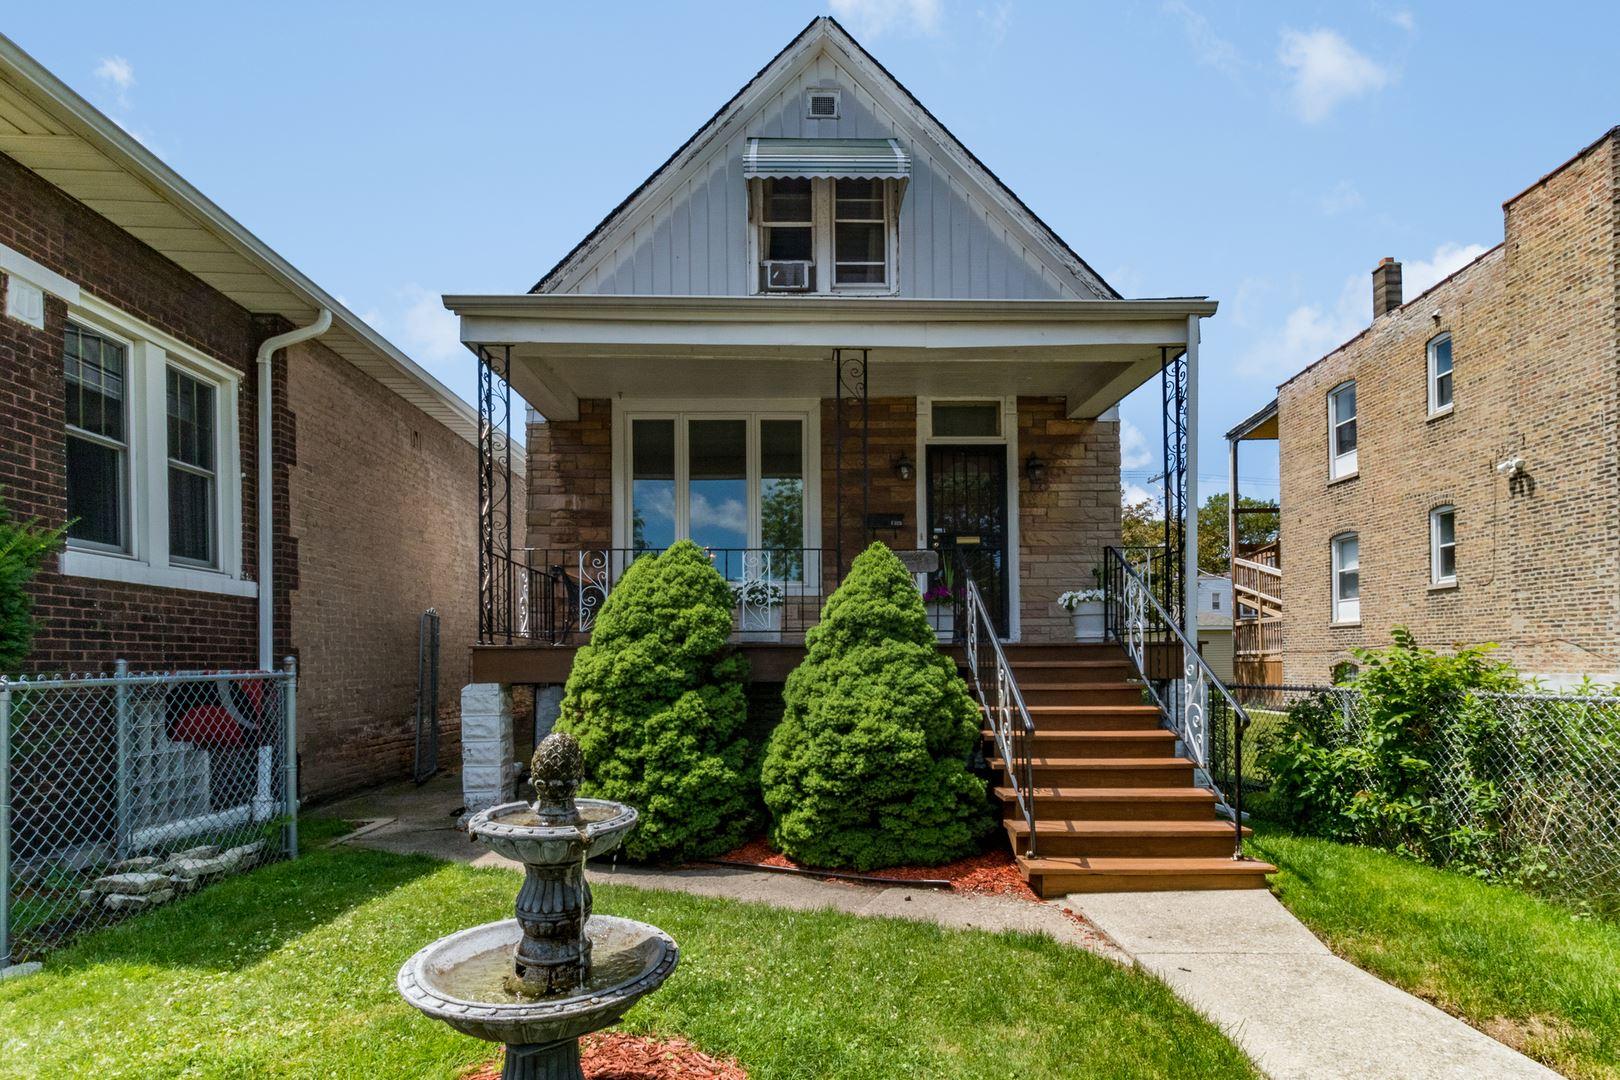 7326 S Langley Avenue, Chicago, IL 60619 - #: 10782196